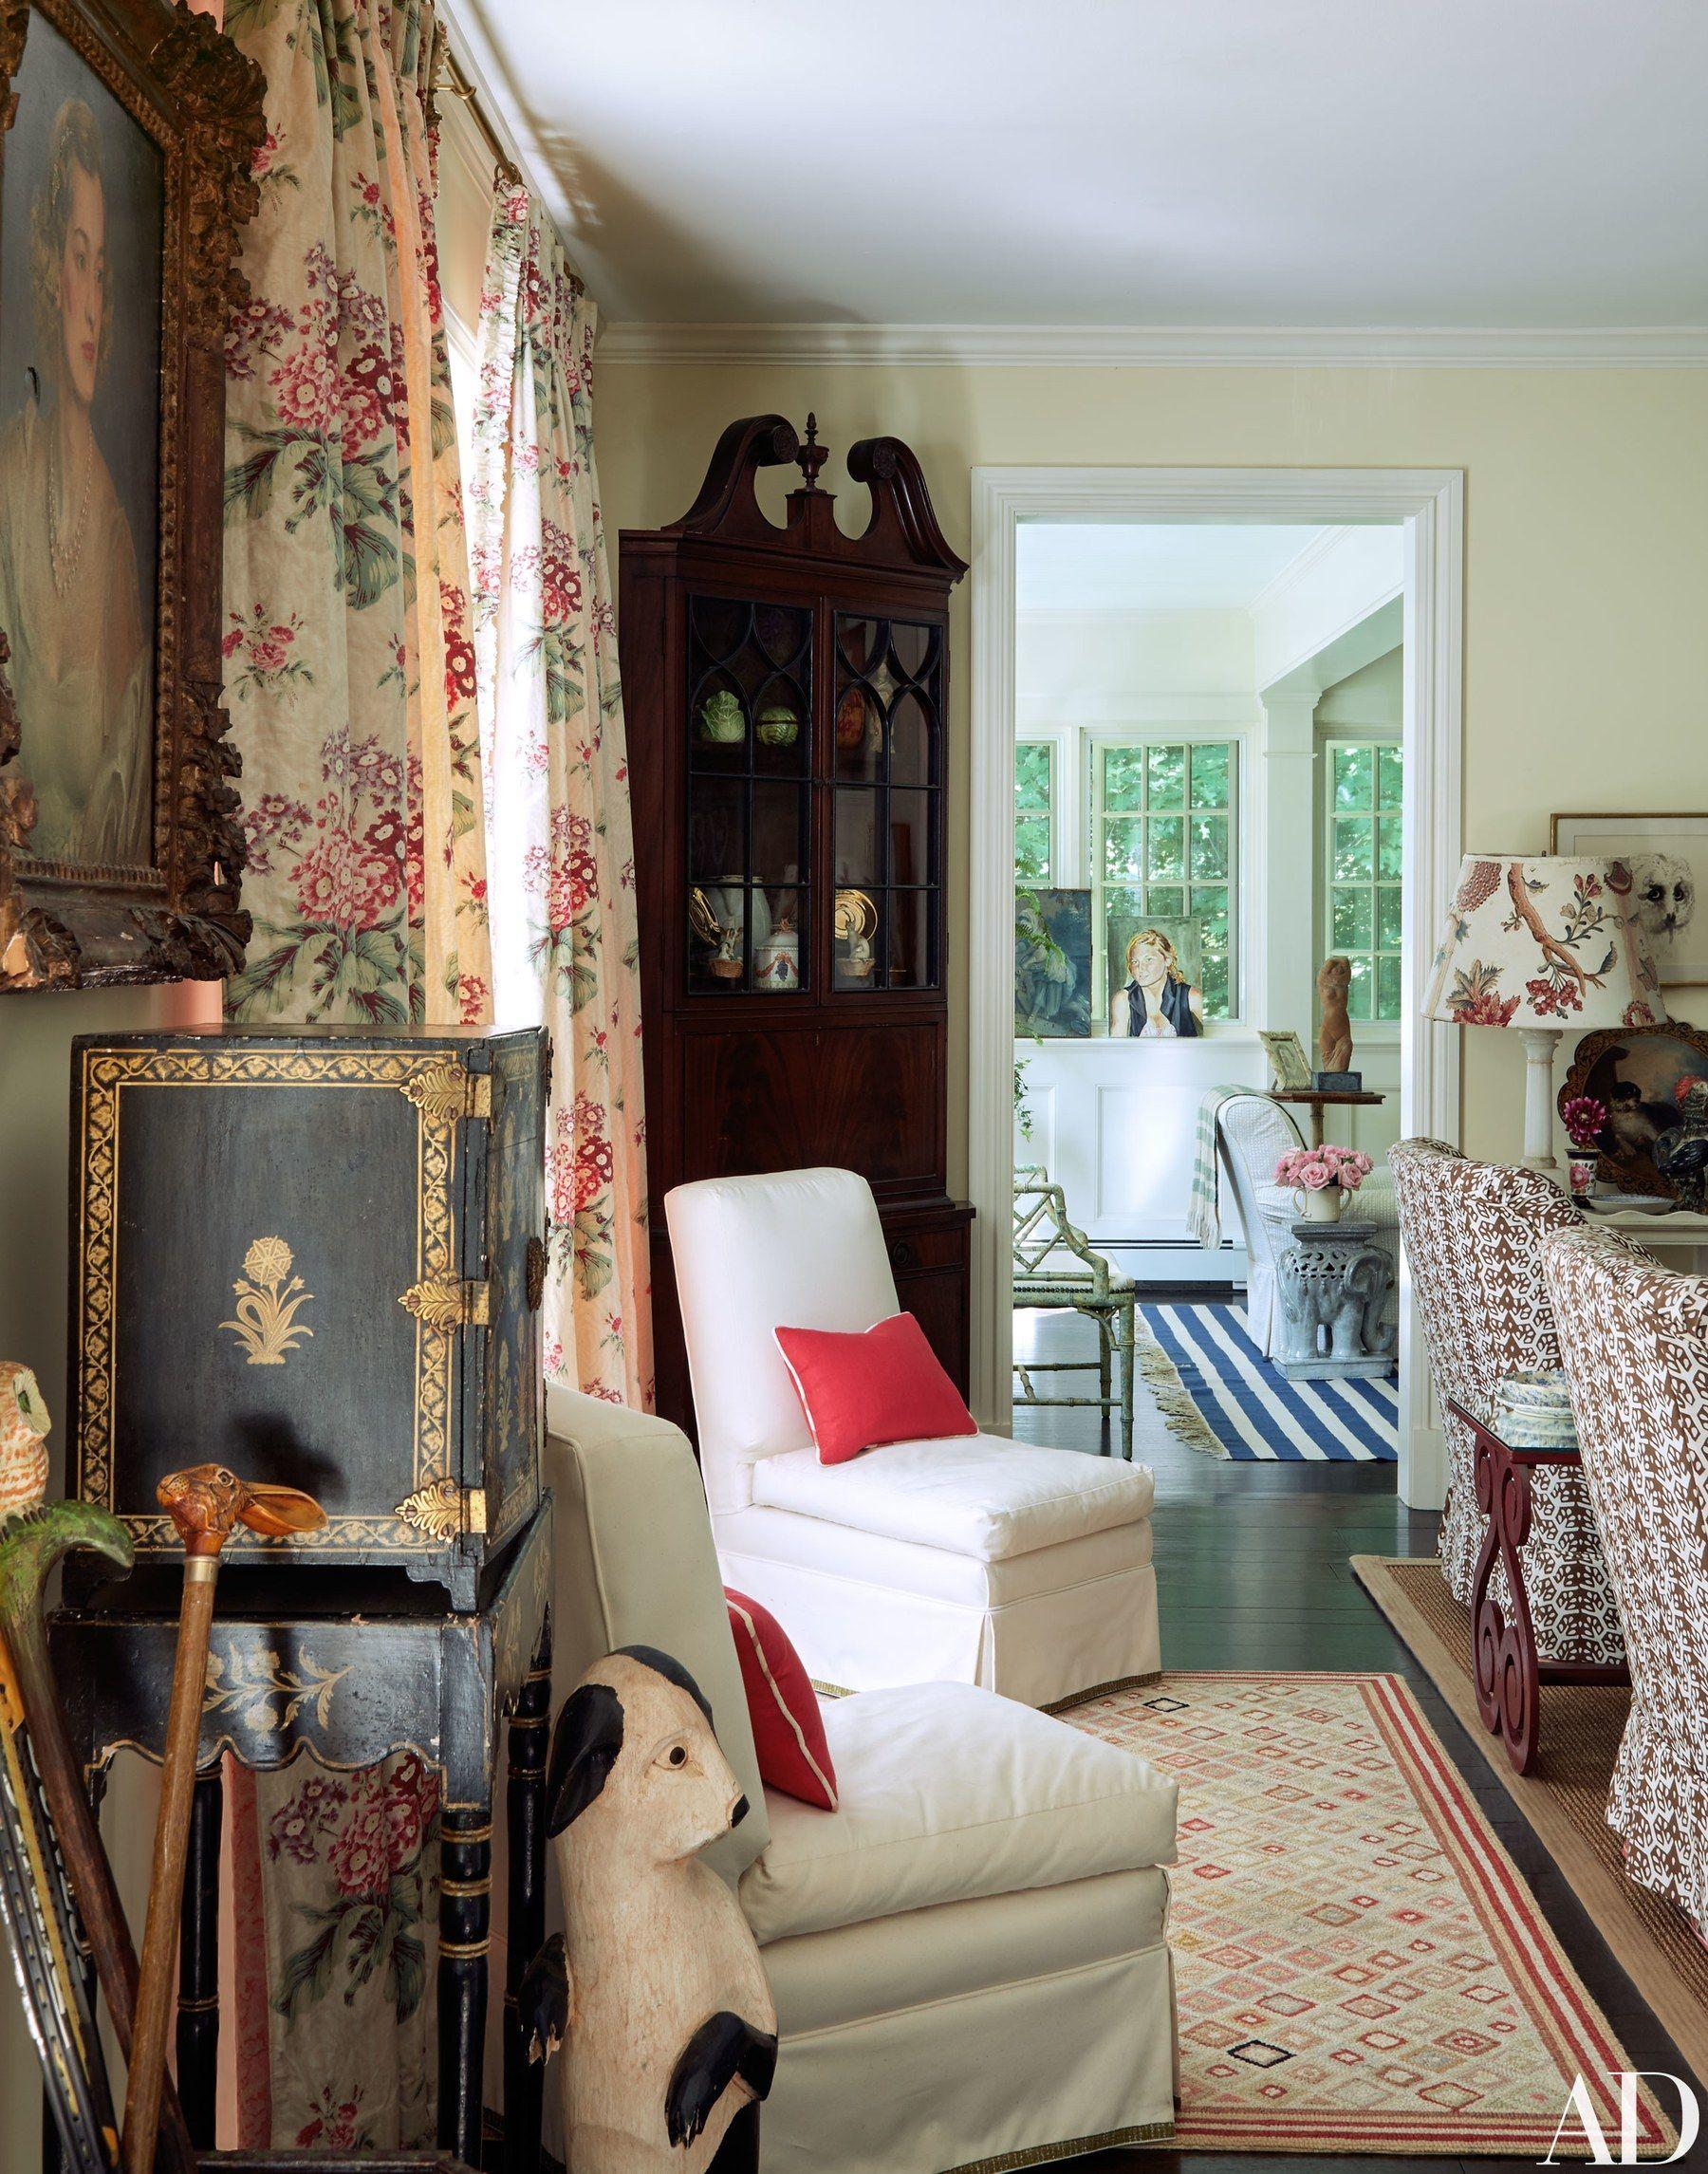 the living room s parish hadley slipper chairs wear a sister parish rh pinterest com